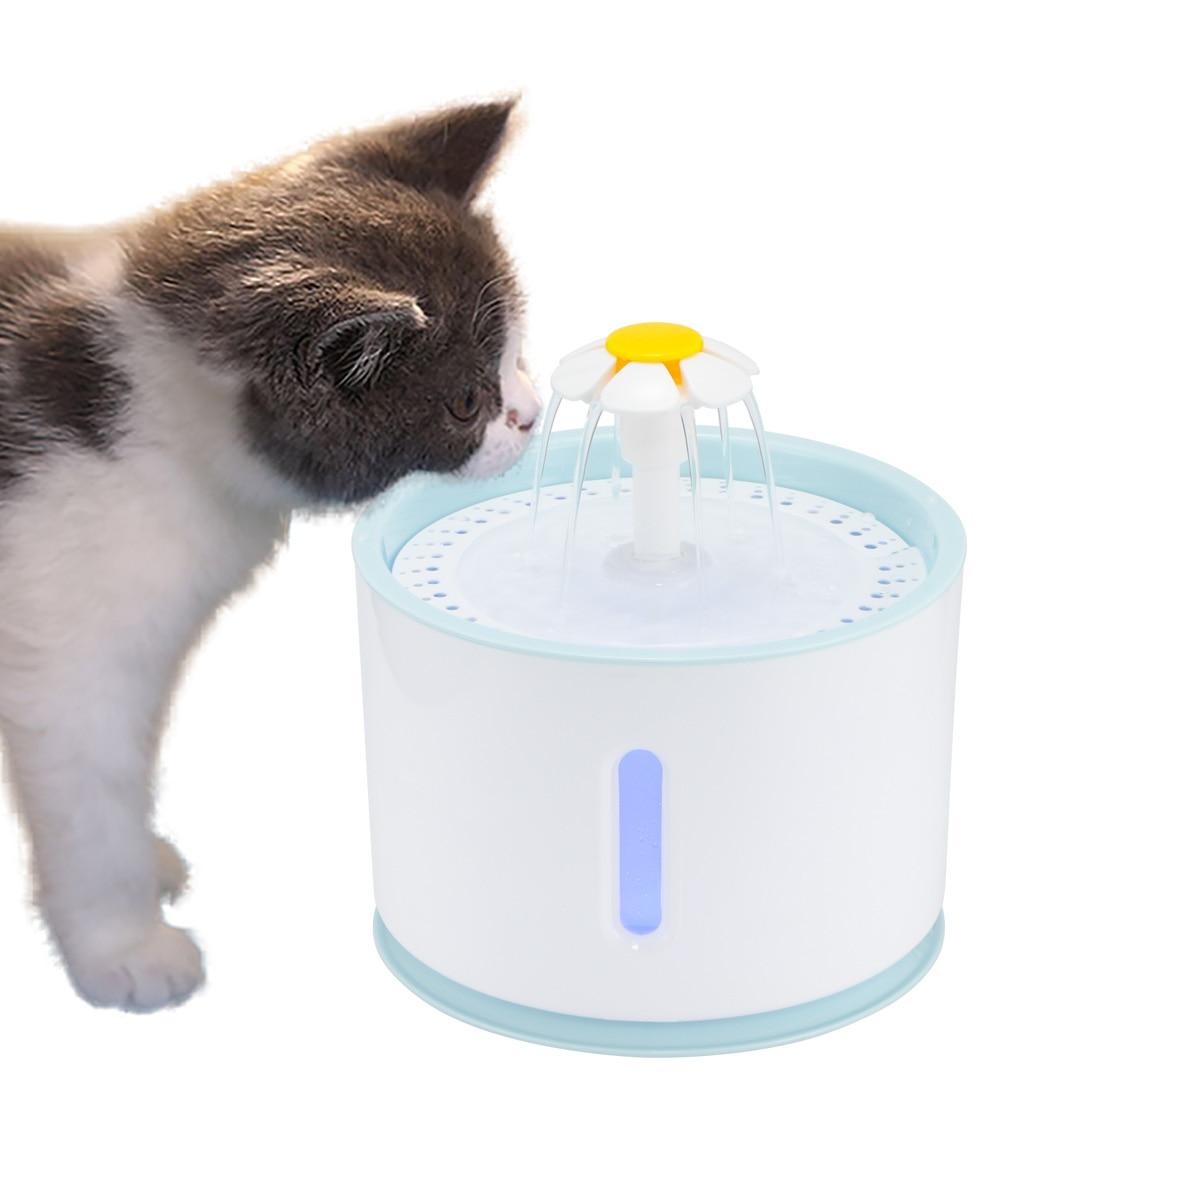 Lemonbest, recipiente para mascotas automático, dispensador de agua potable, fuente de beber para mascotas eléctrica con filtro de bebida LED